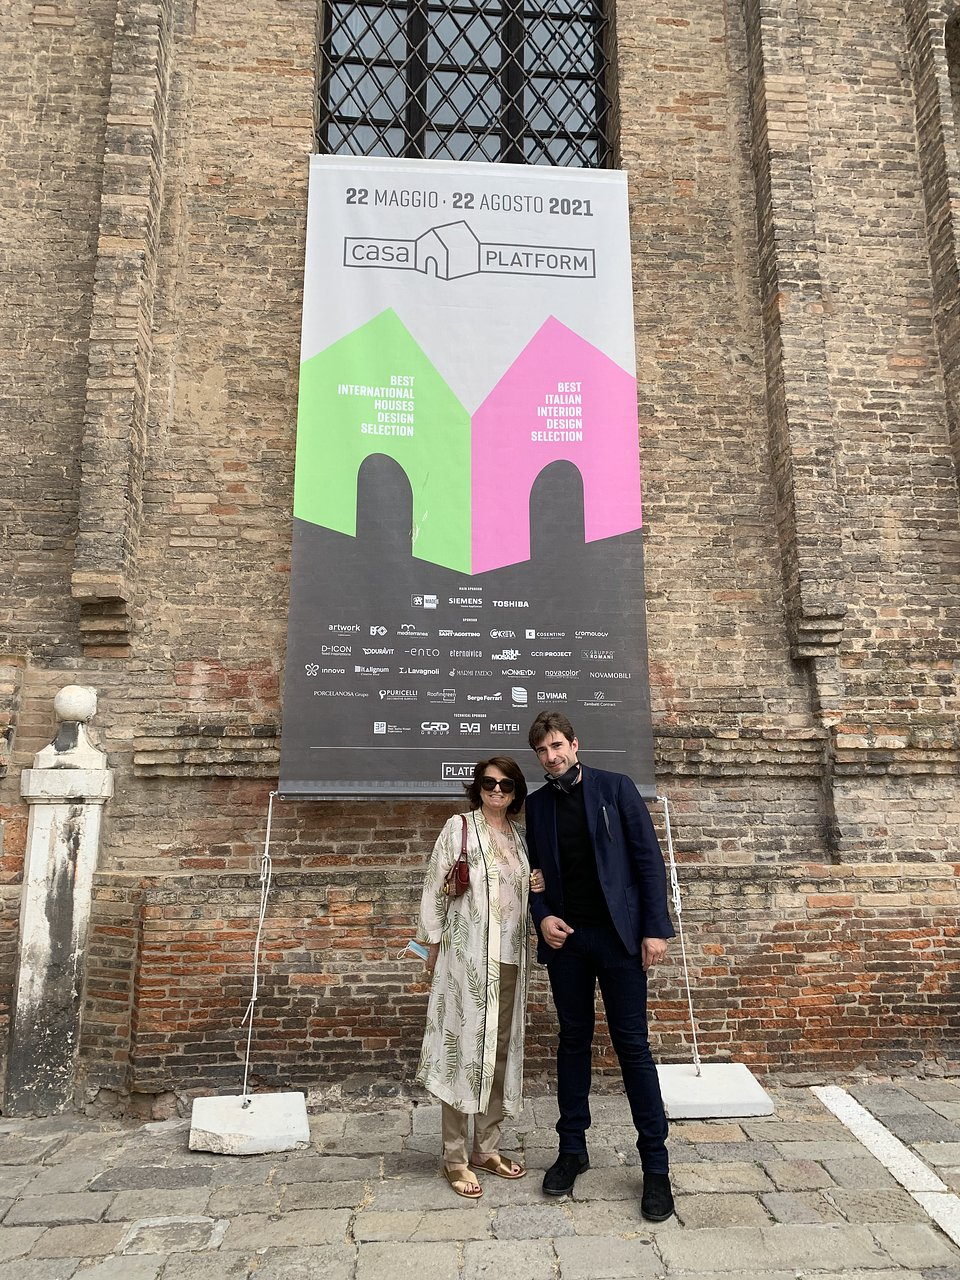 CasaPlatform@Venezia 2021 (7).jpeg